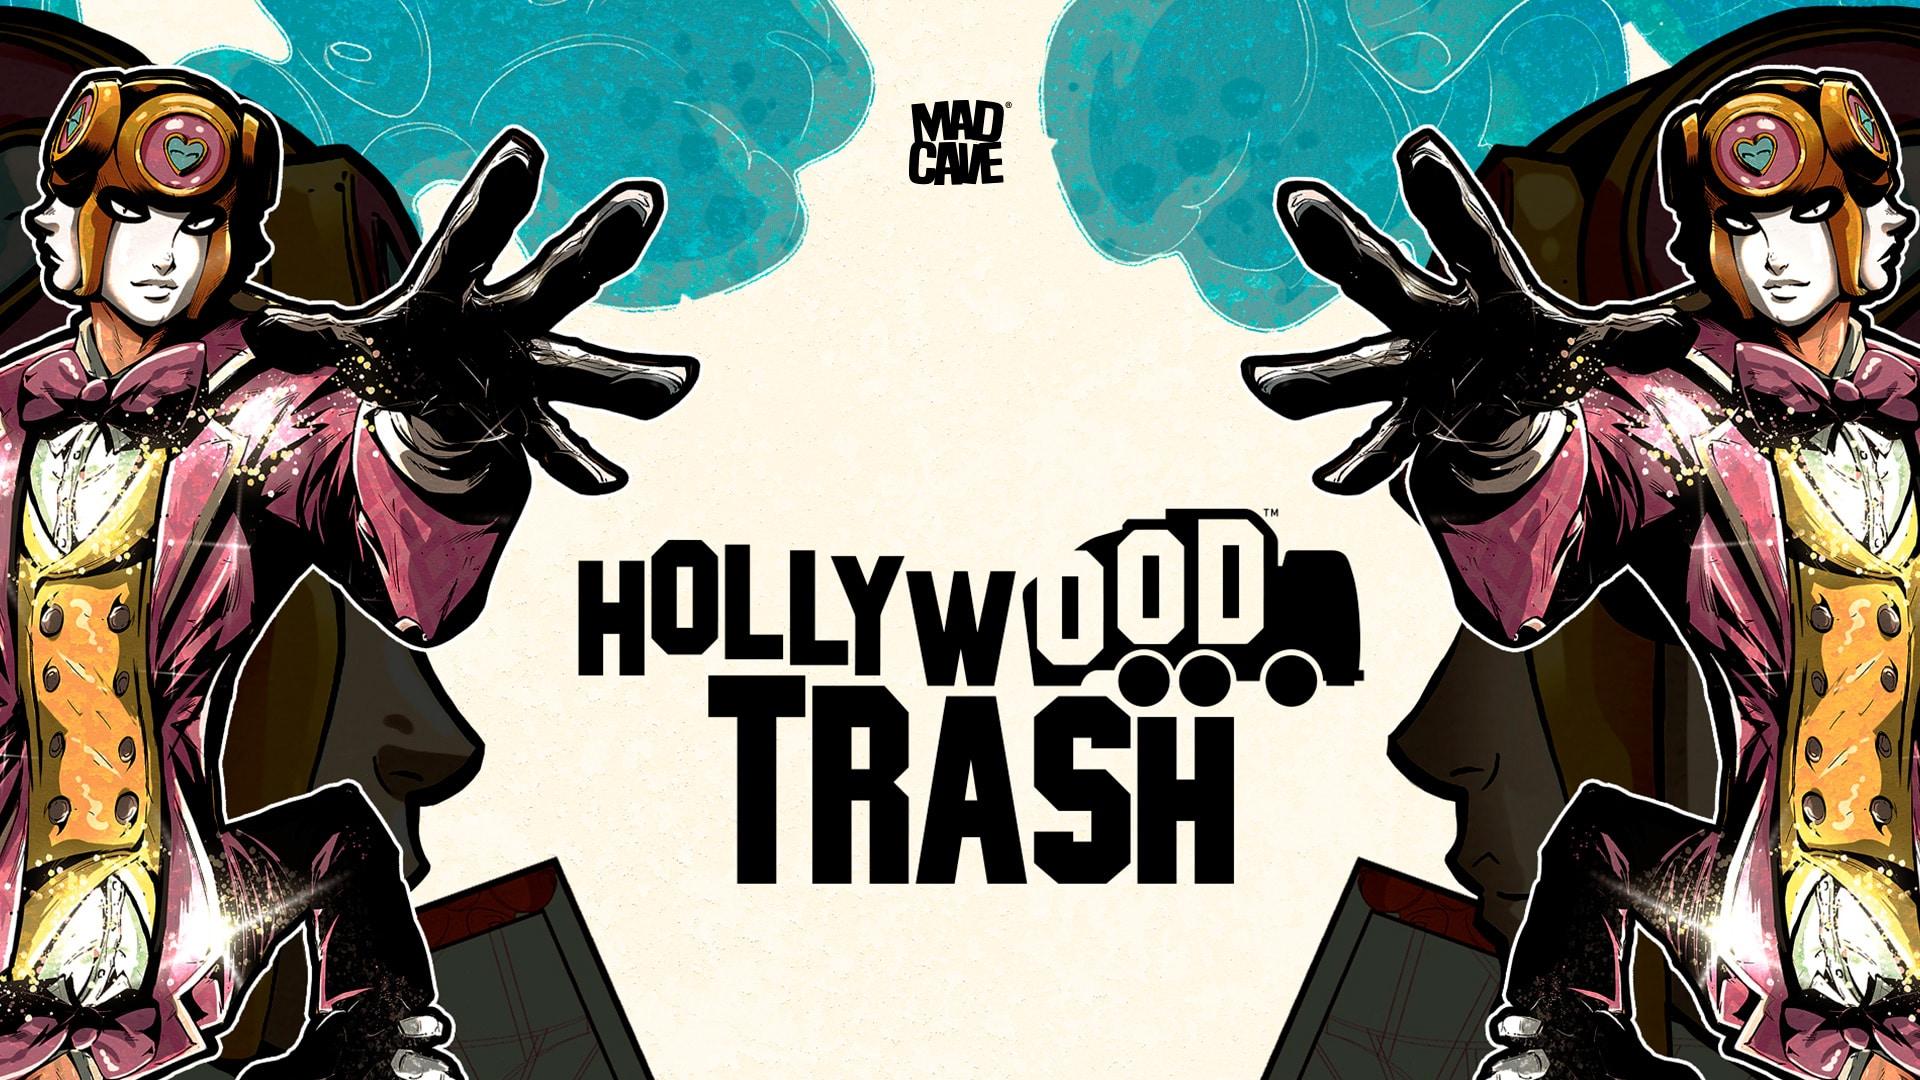 Hollywood Trash - Wallpaper